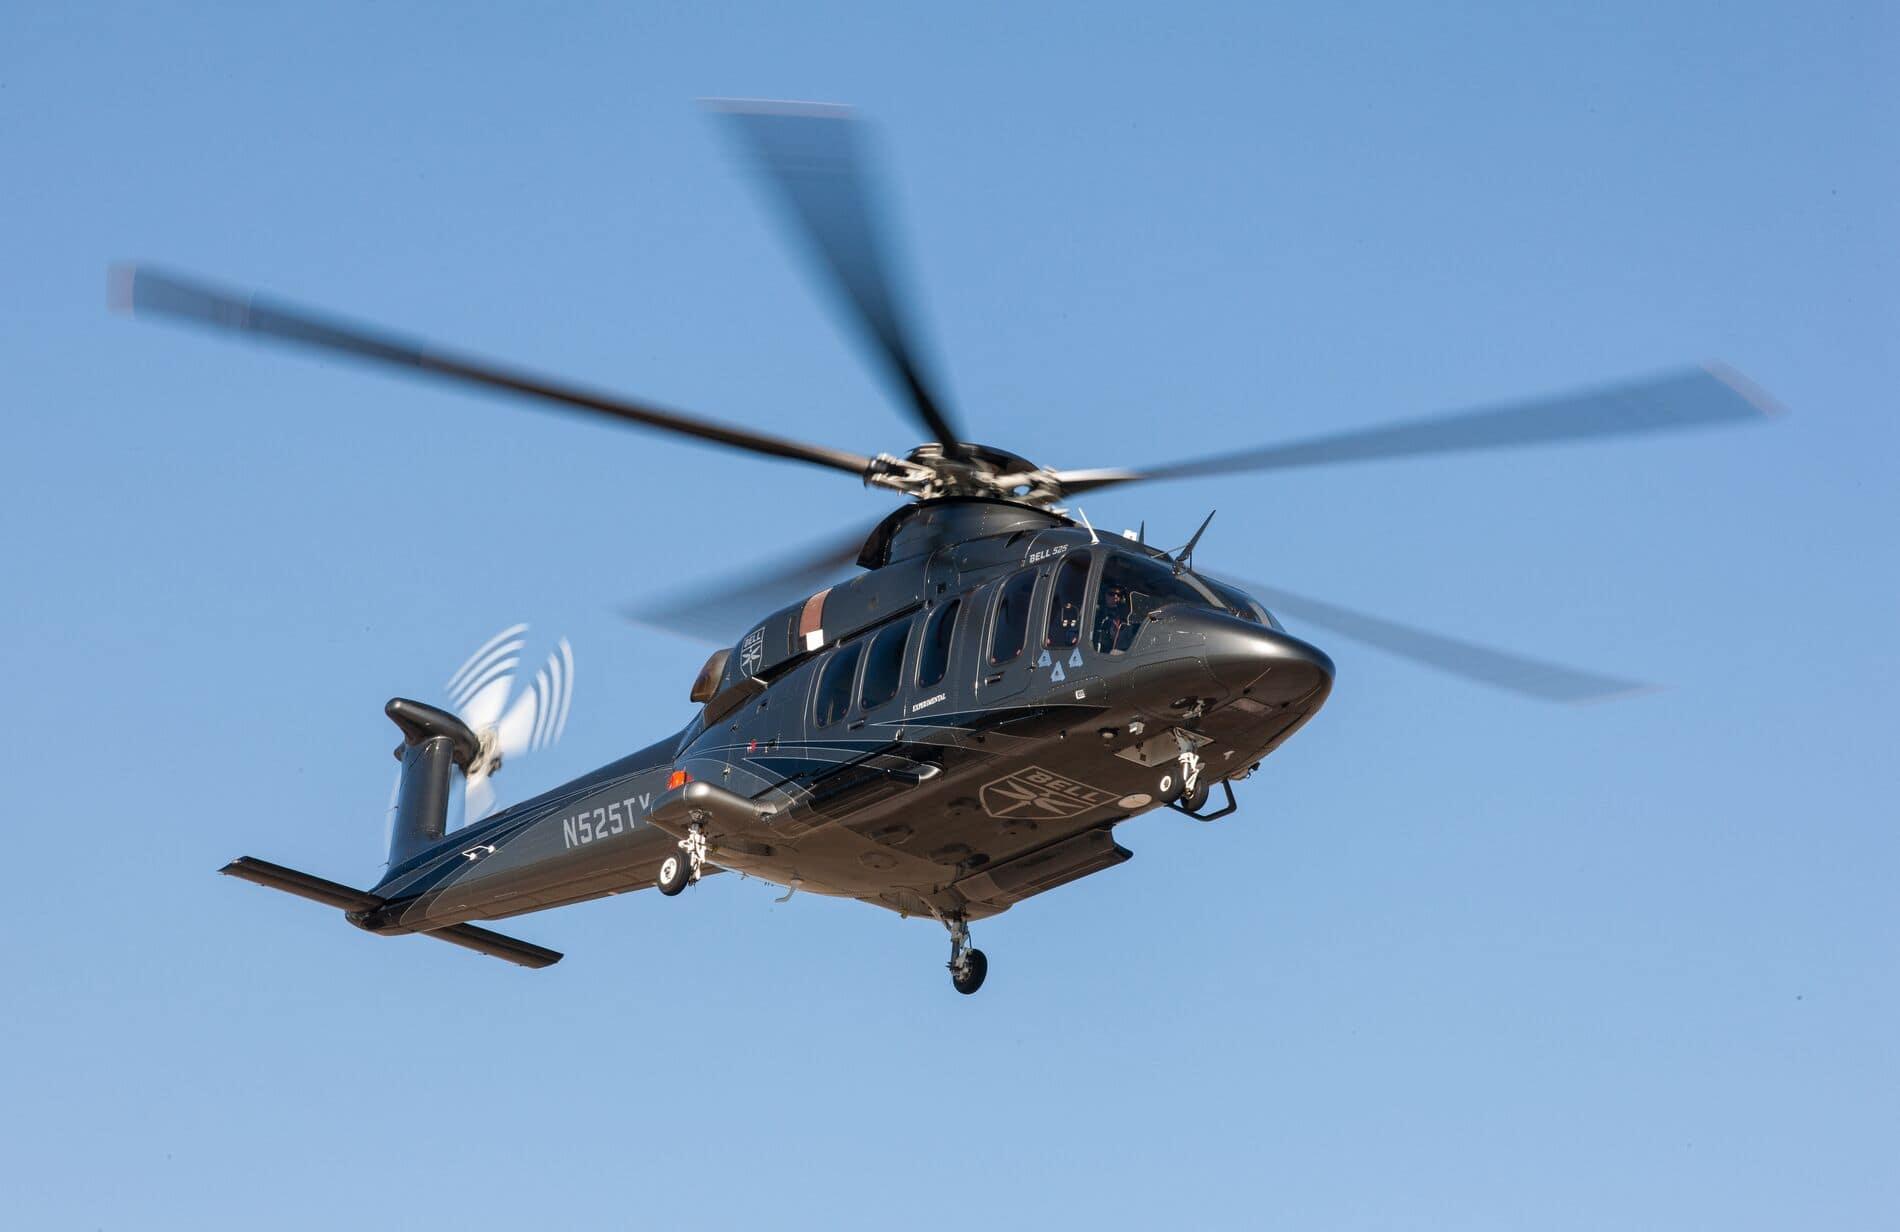 Bell 525 en vol et vue de trois quart avec ciel bleu